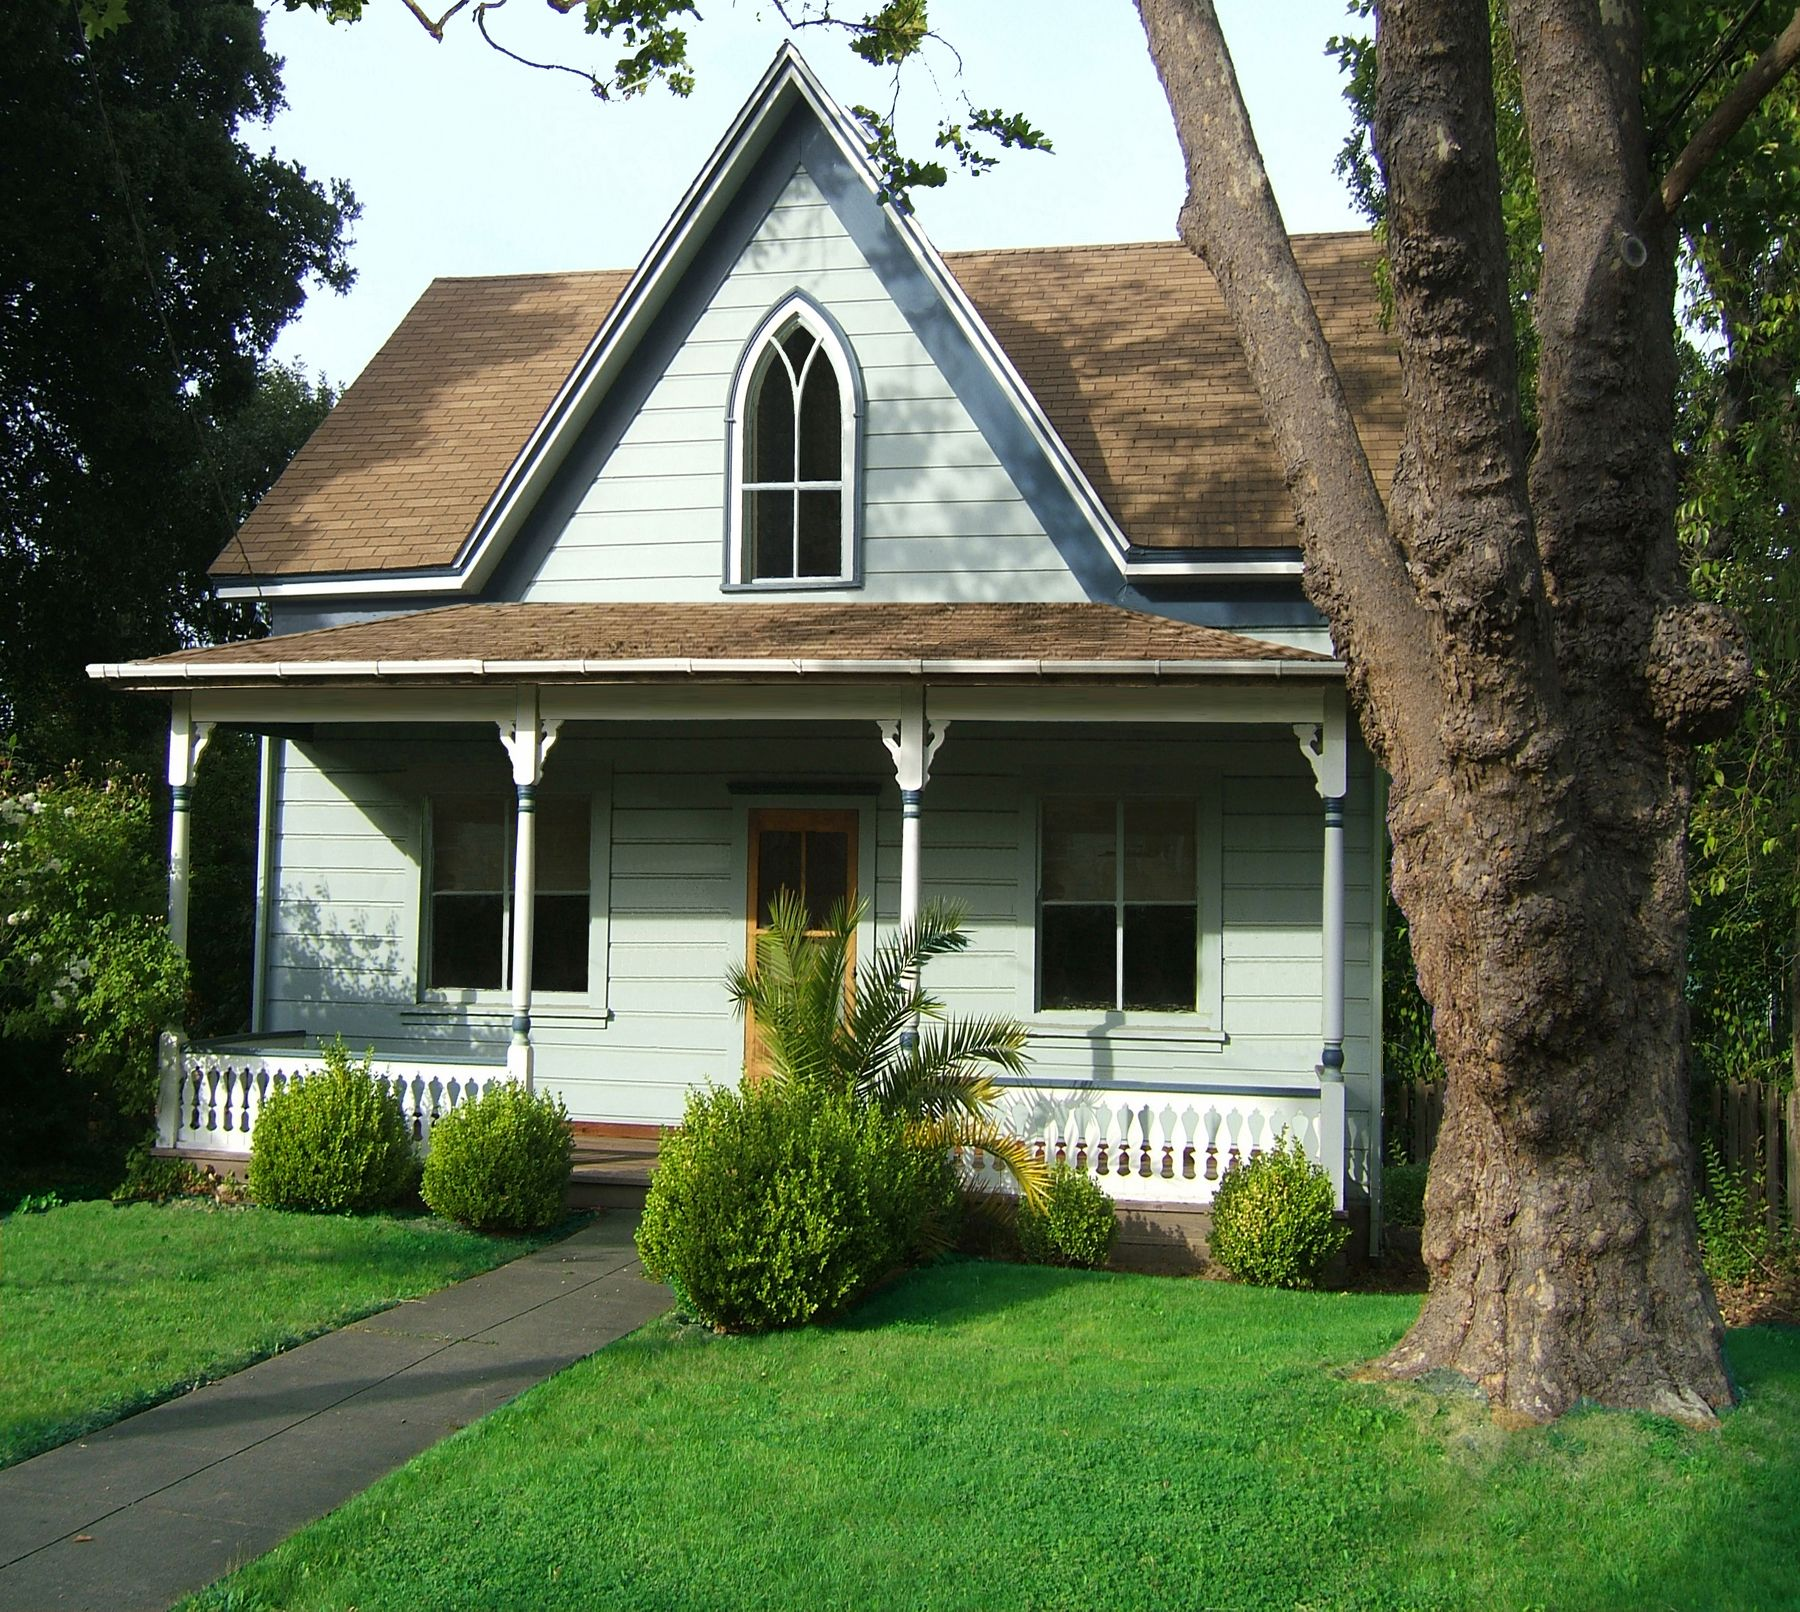 Tumbleweed Tiny House Cottages: Tiny House Company, Tumbleweed Tiny